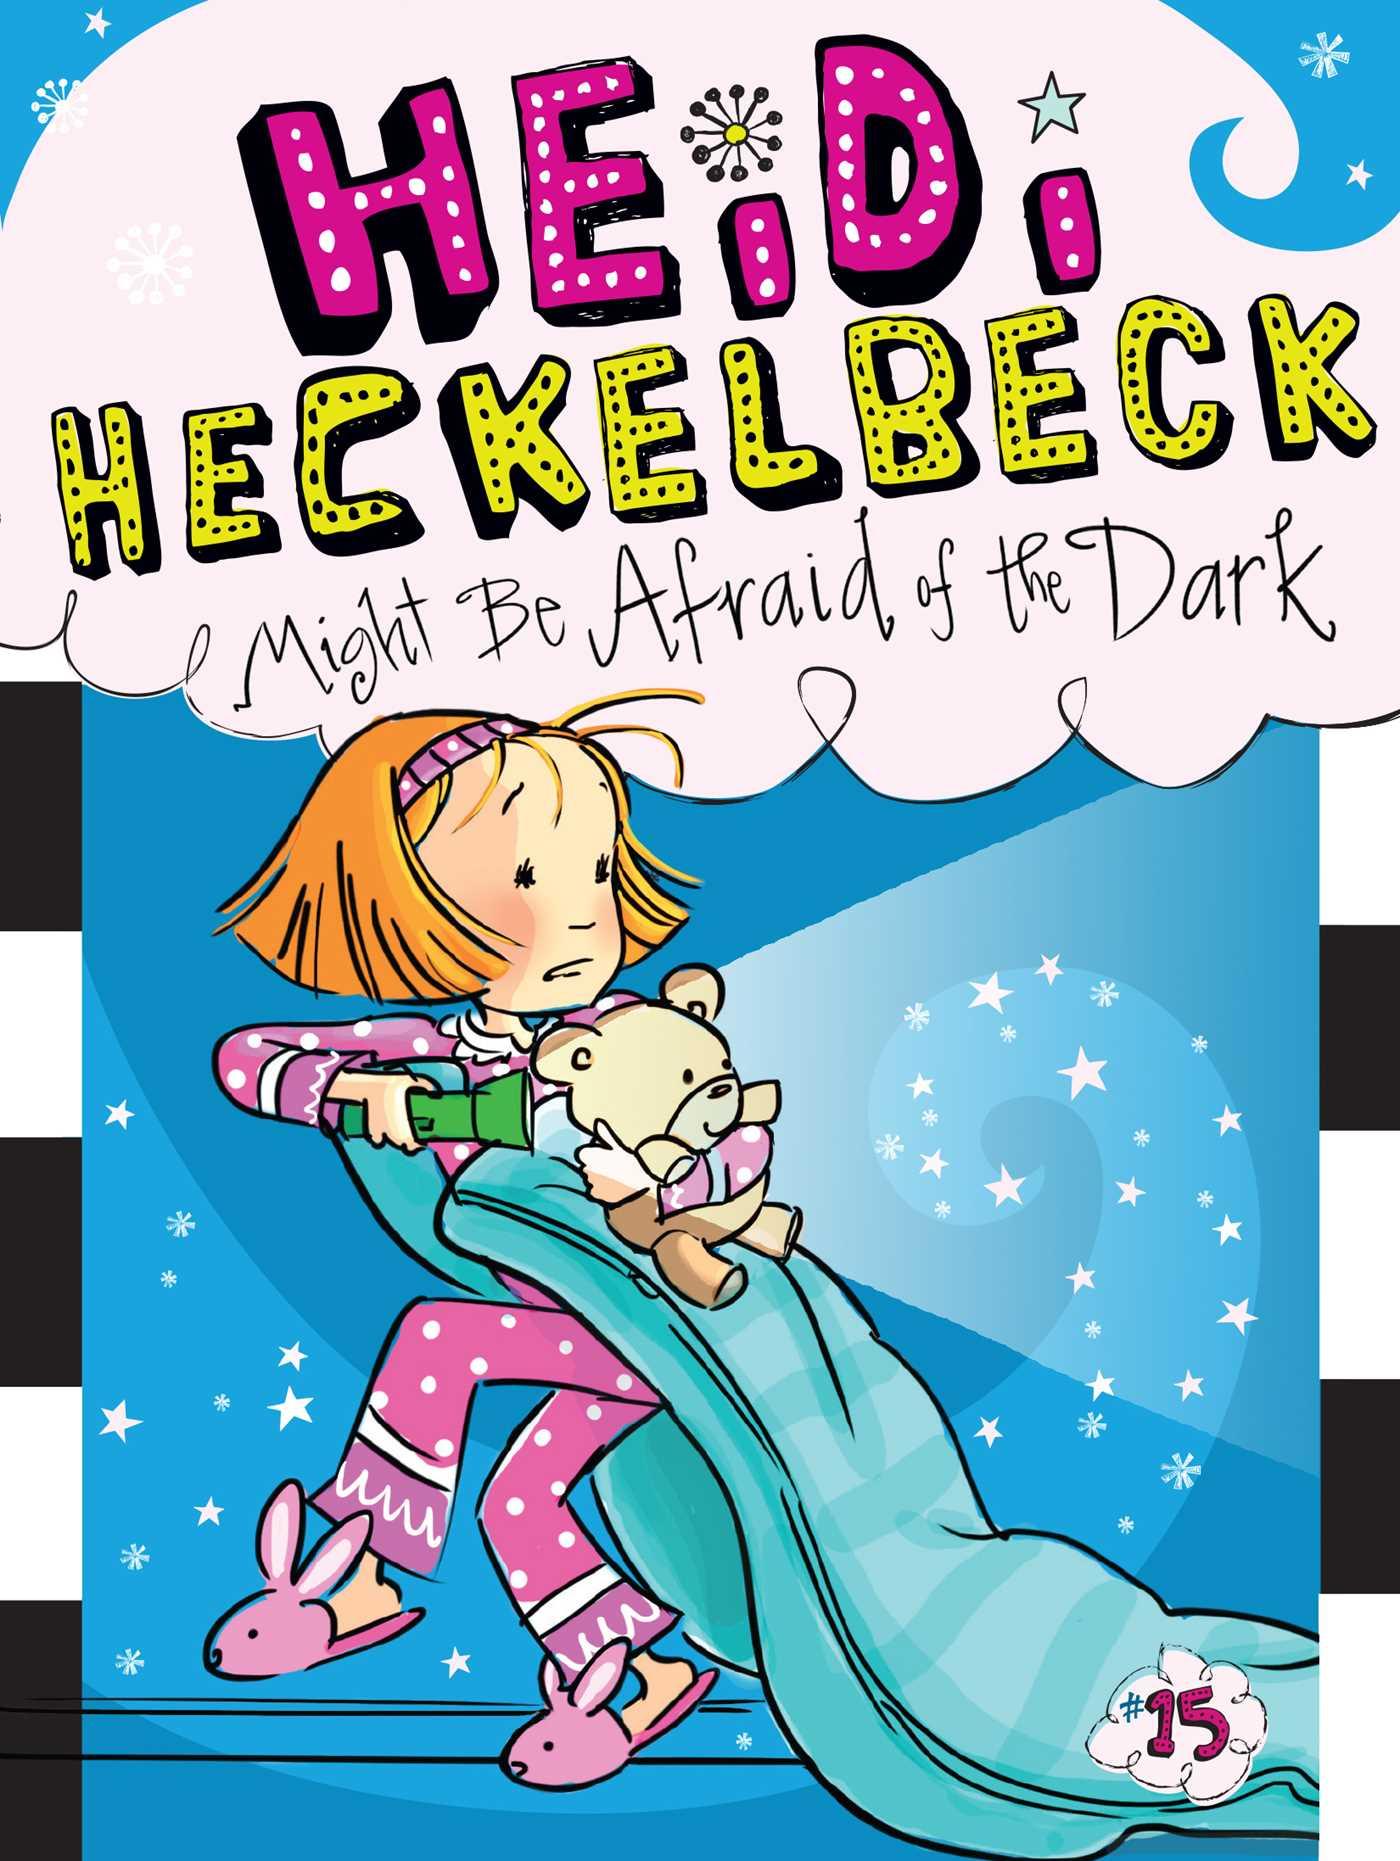 Heidi heckelbeck might be afraid of the dark 9781481446280 hr